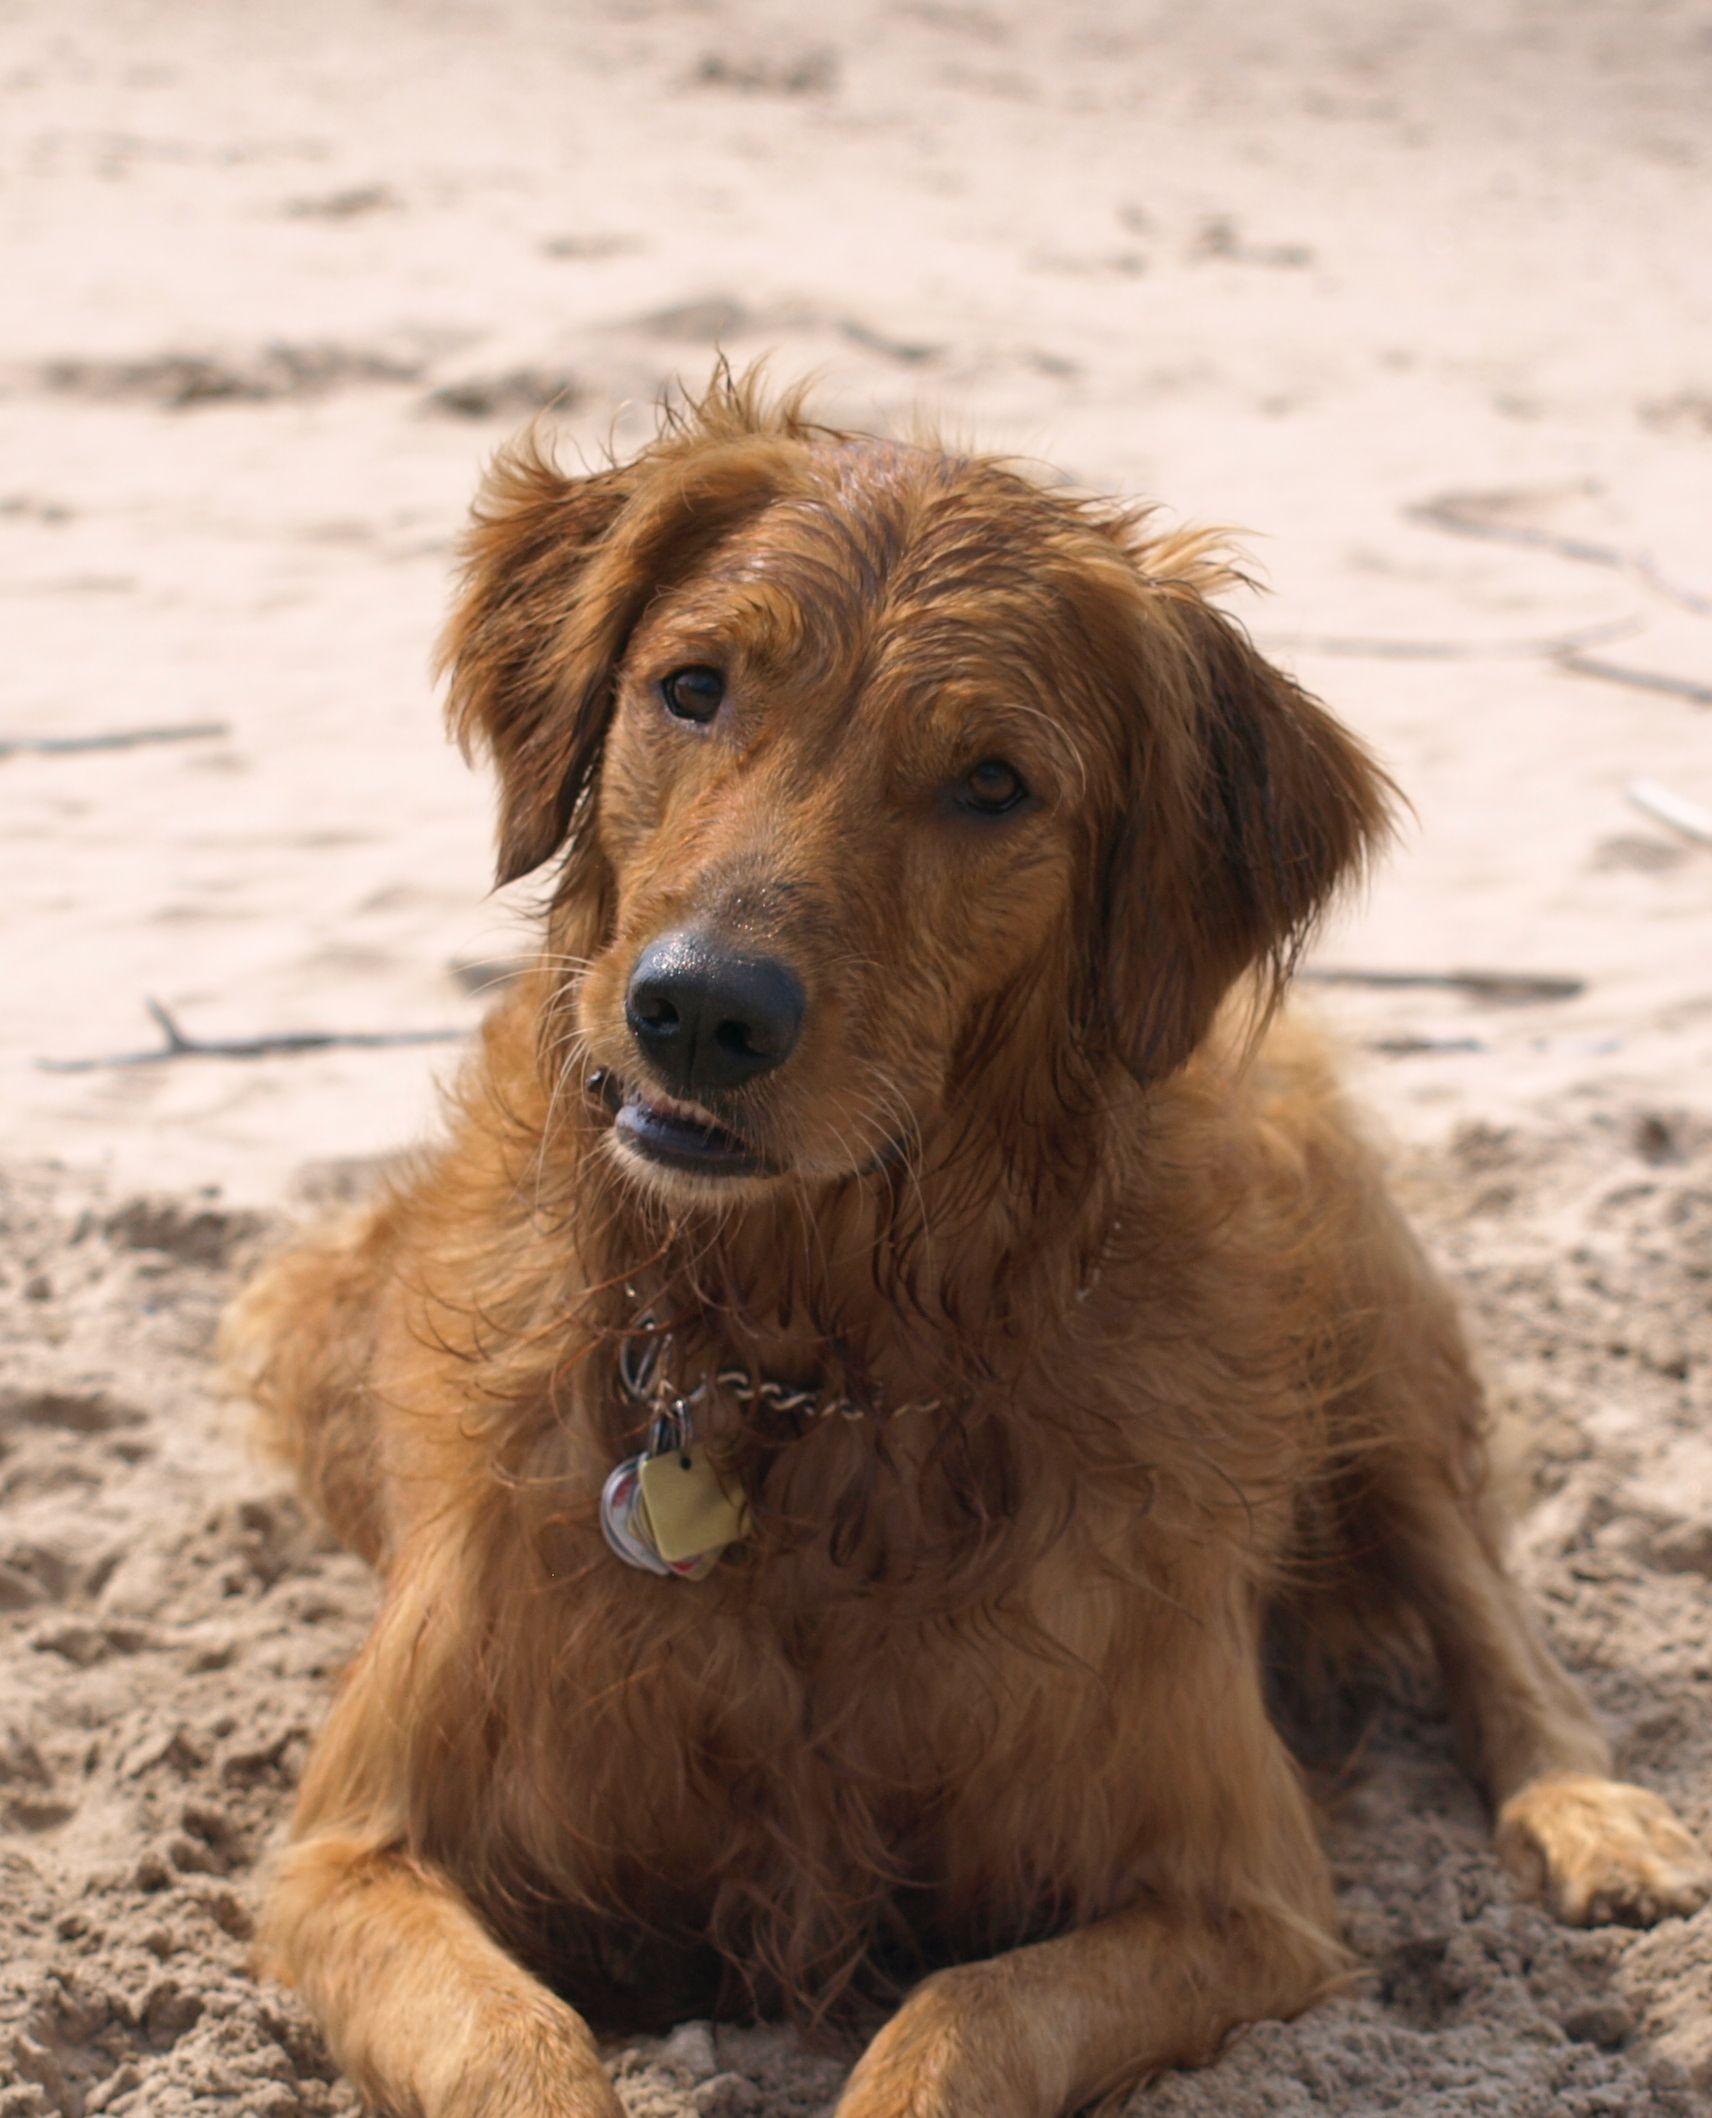 Gordie Hobbs Golden Retriever Grand Bend Beach Golden Retriever